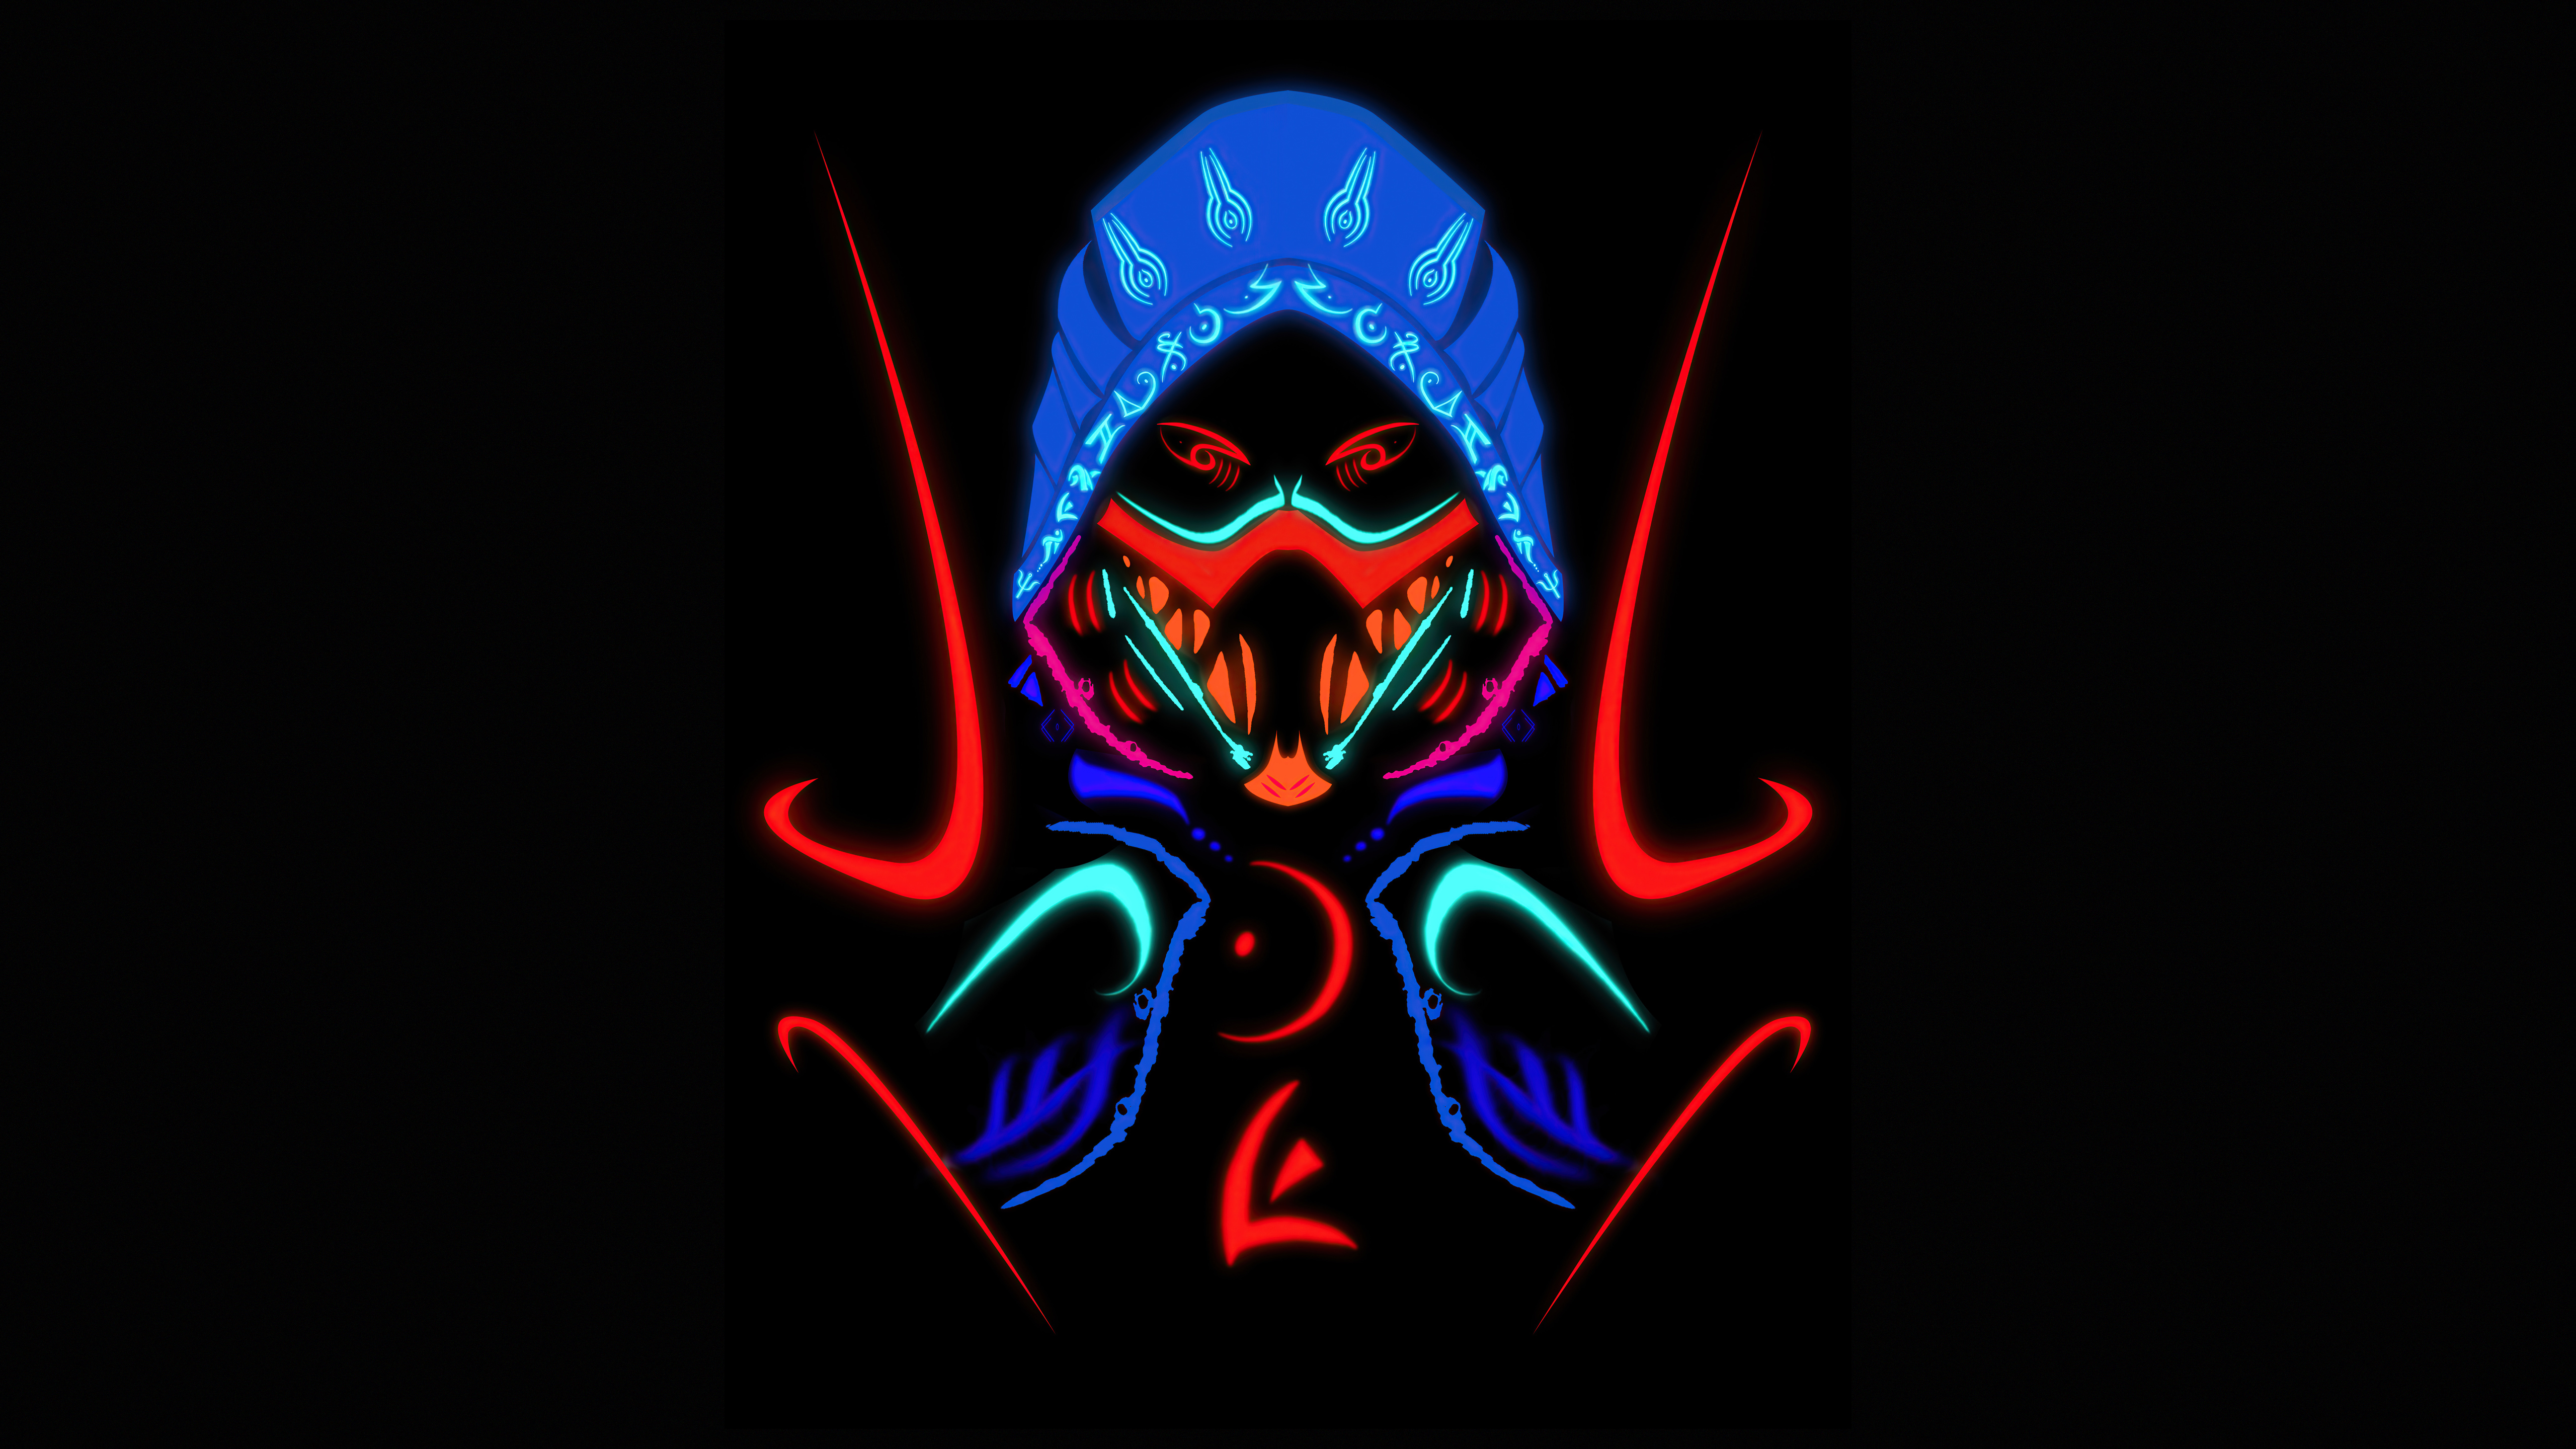 scorpion-samurai-mortal-kombat-minimal-5k-ka.jpg